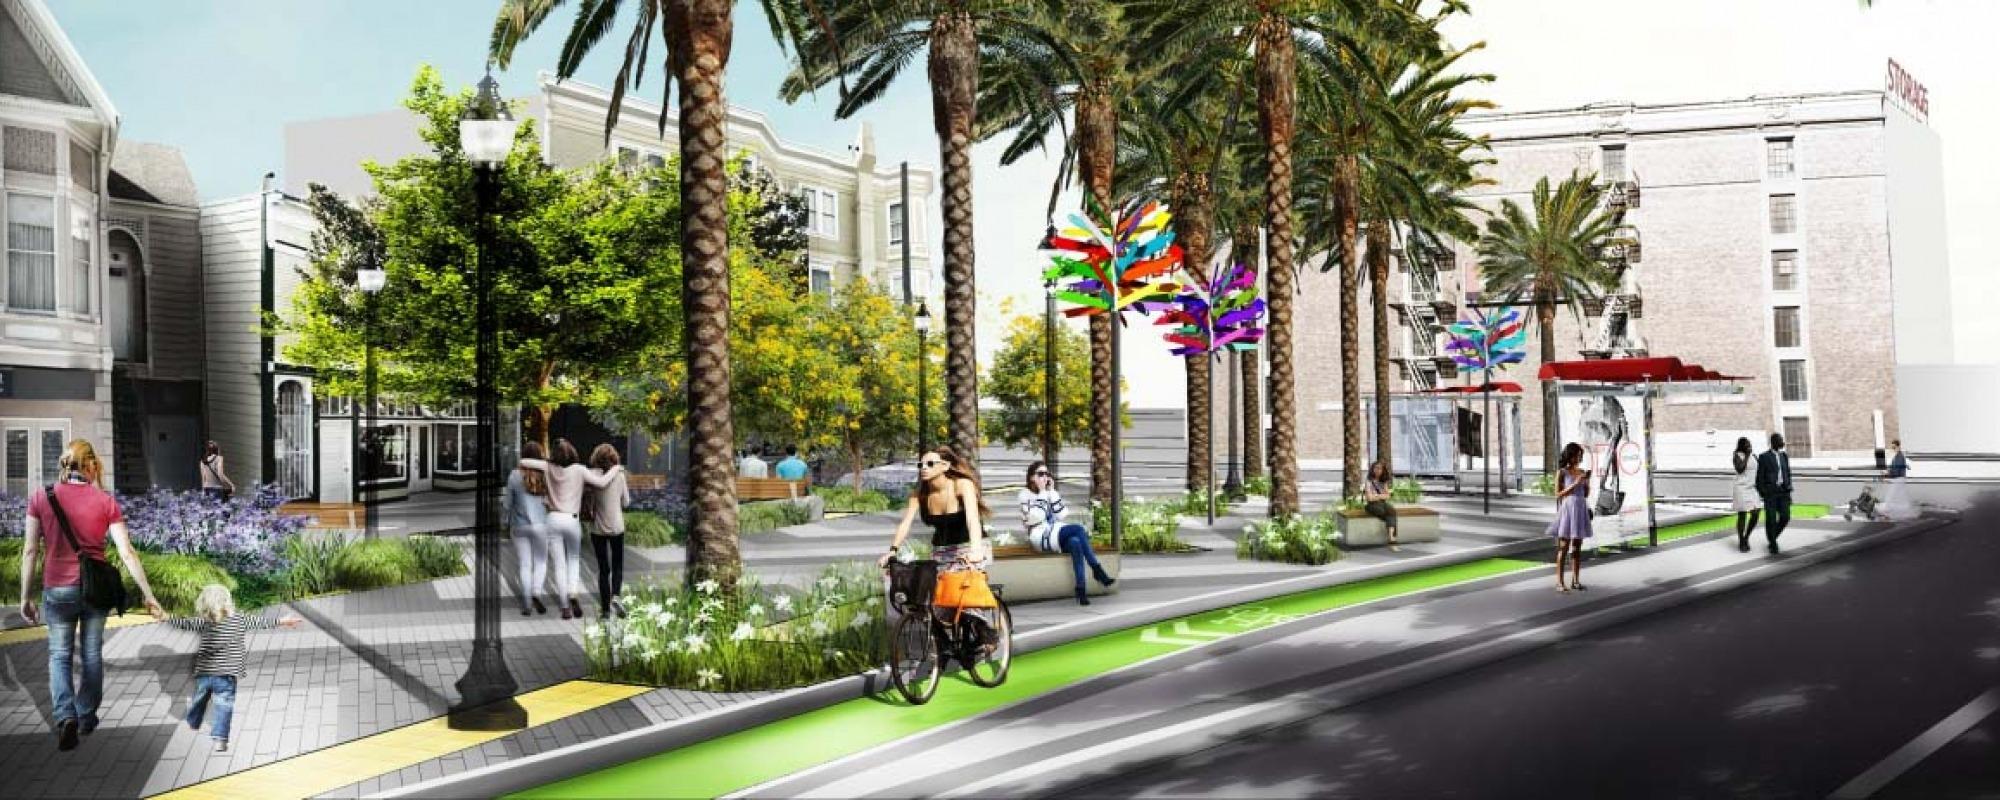 Masonic Avenue Streetscape Improvement Project rendering